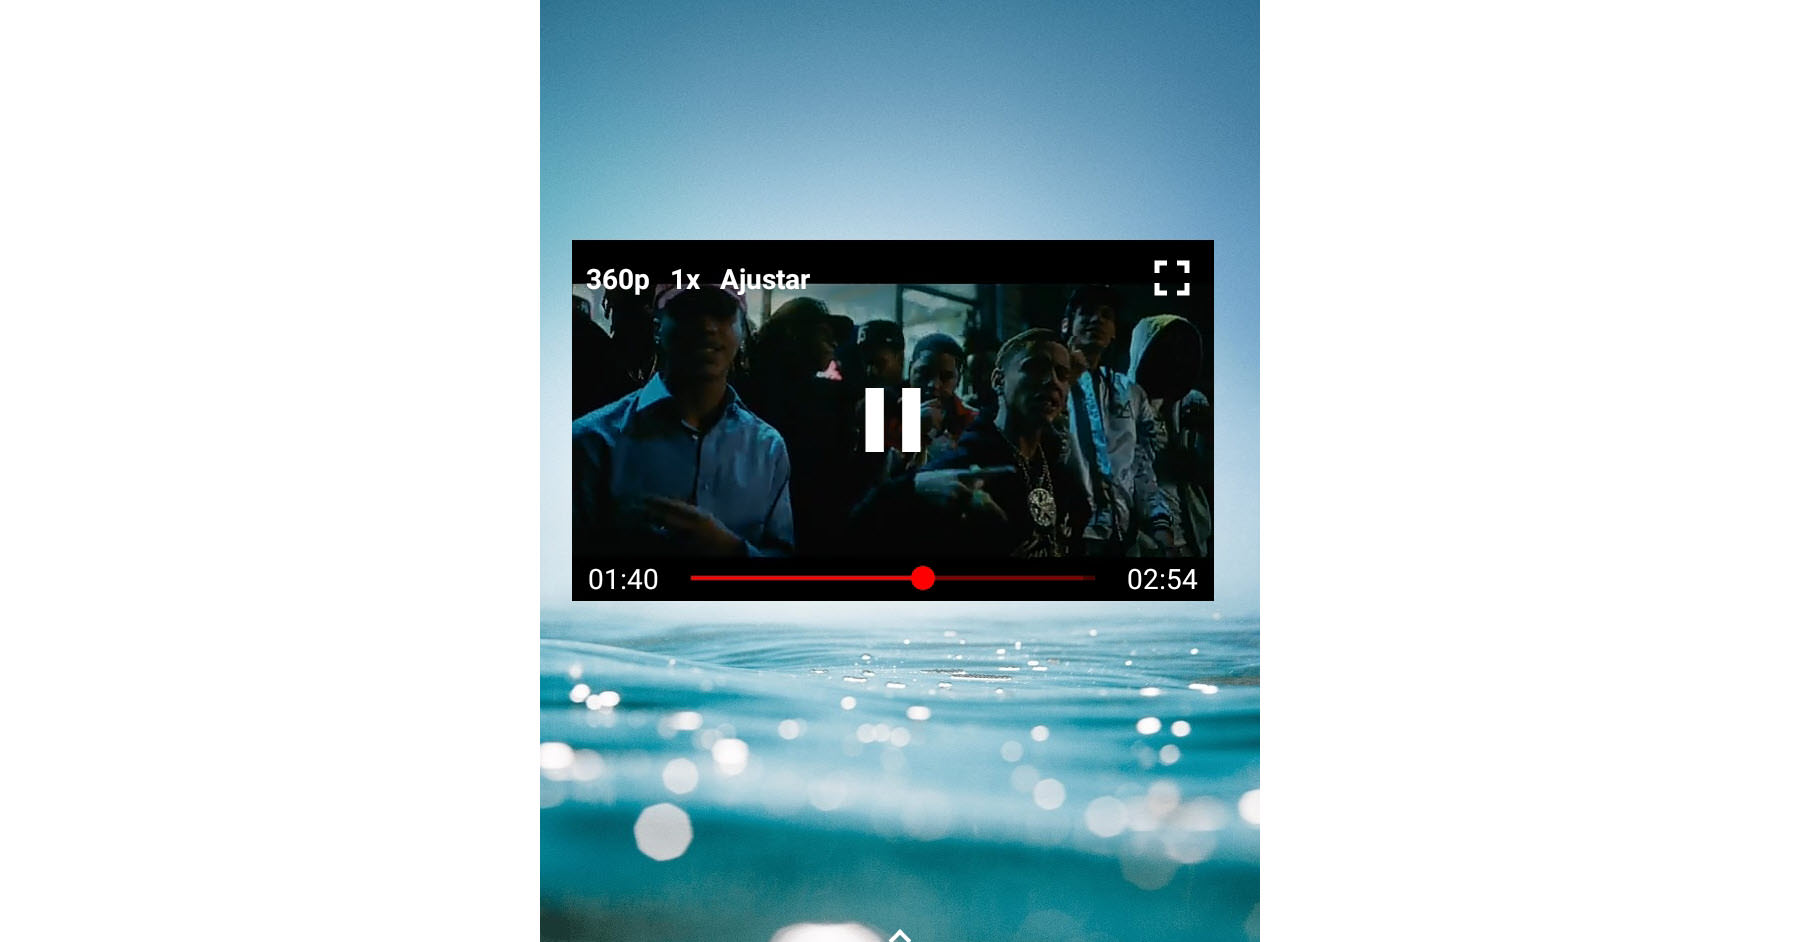 Cómo ver YouTube en modo ventana o emergente con NewPipe